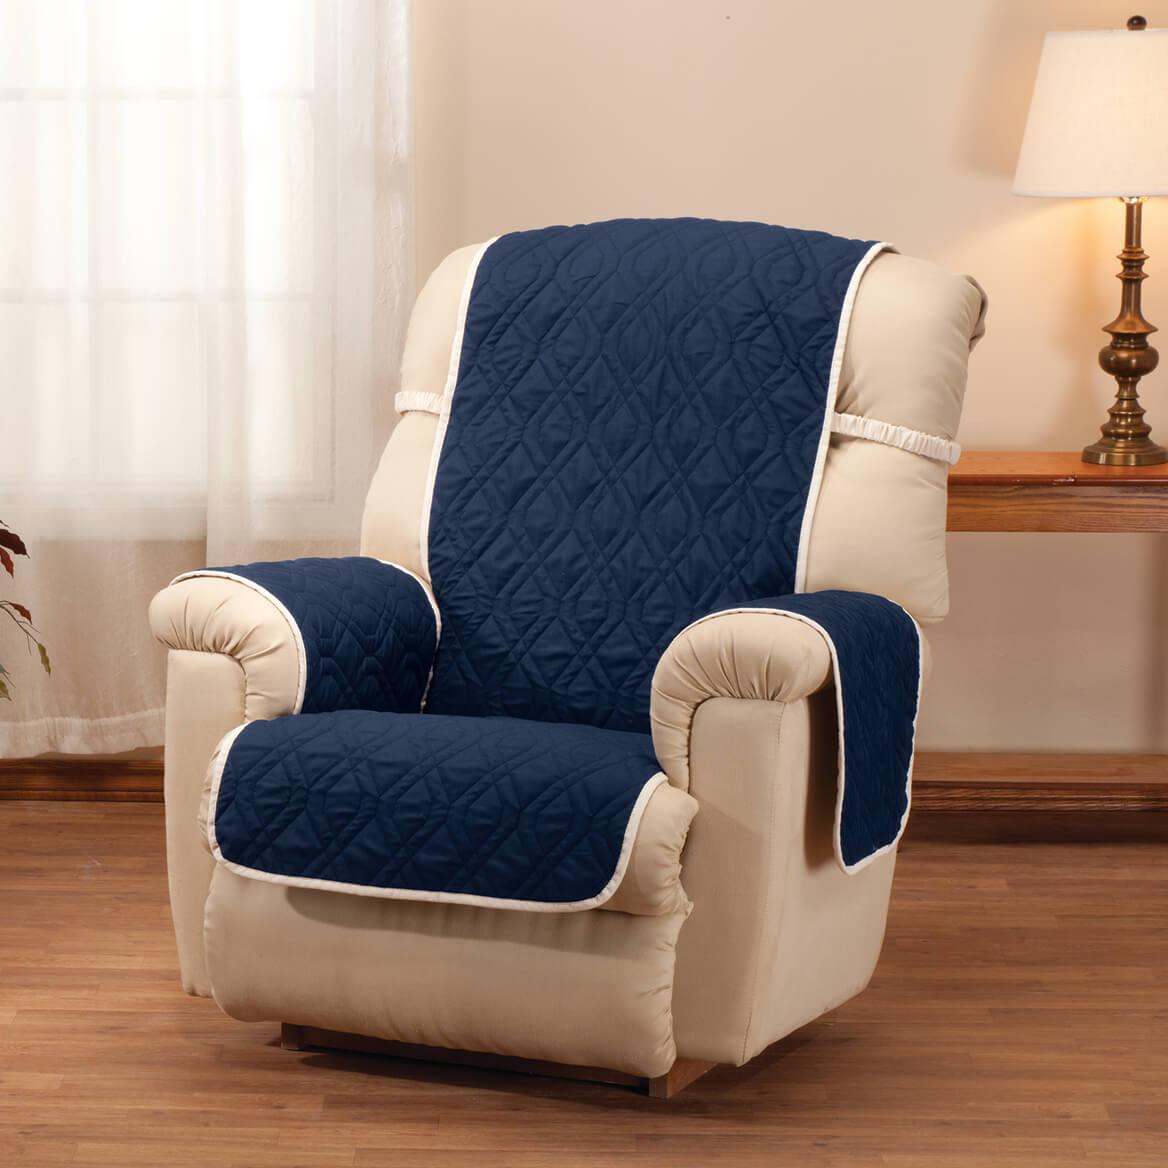 Enjoyable Deluxe Reversible Waterproof Recliner Chair Cover Creativecarmelina Interior Chair Design Creativecarmelinacom